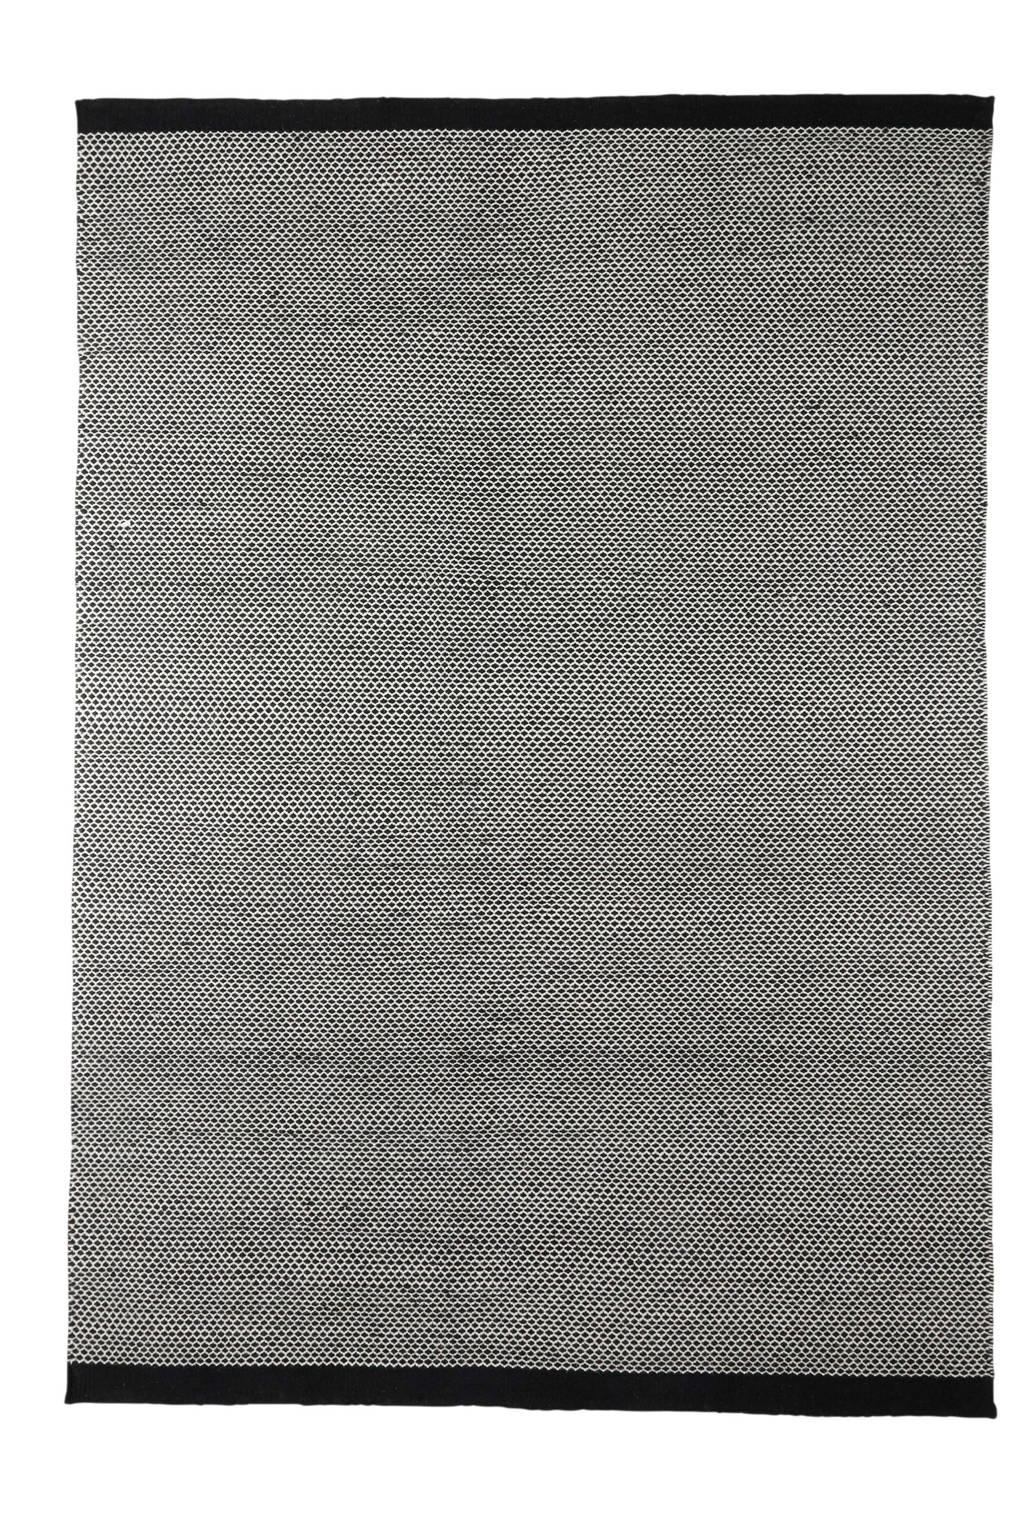 Brink & Campman vloerkleed Radja  (280x200 cm), Grijs